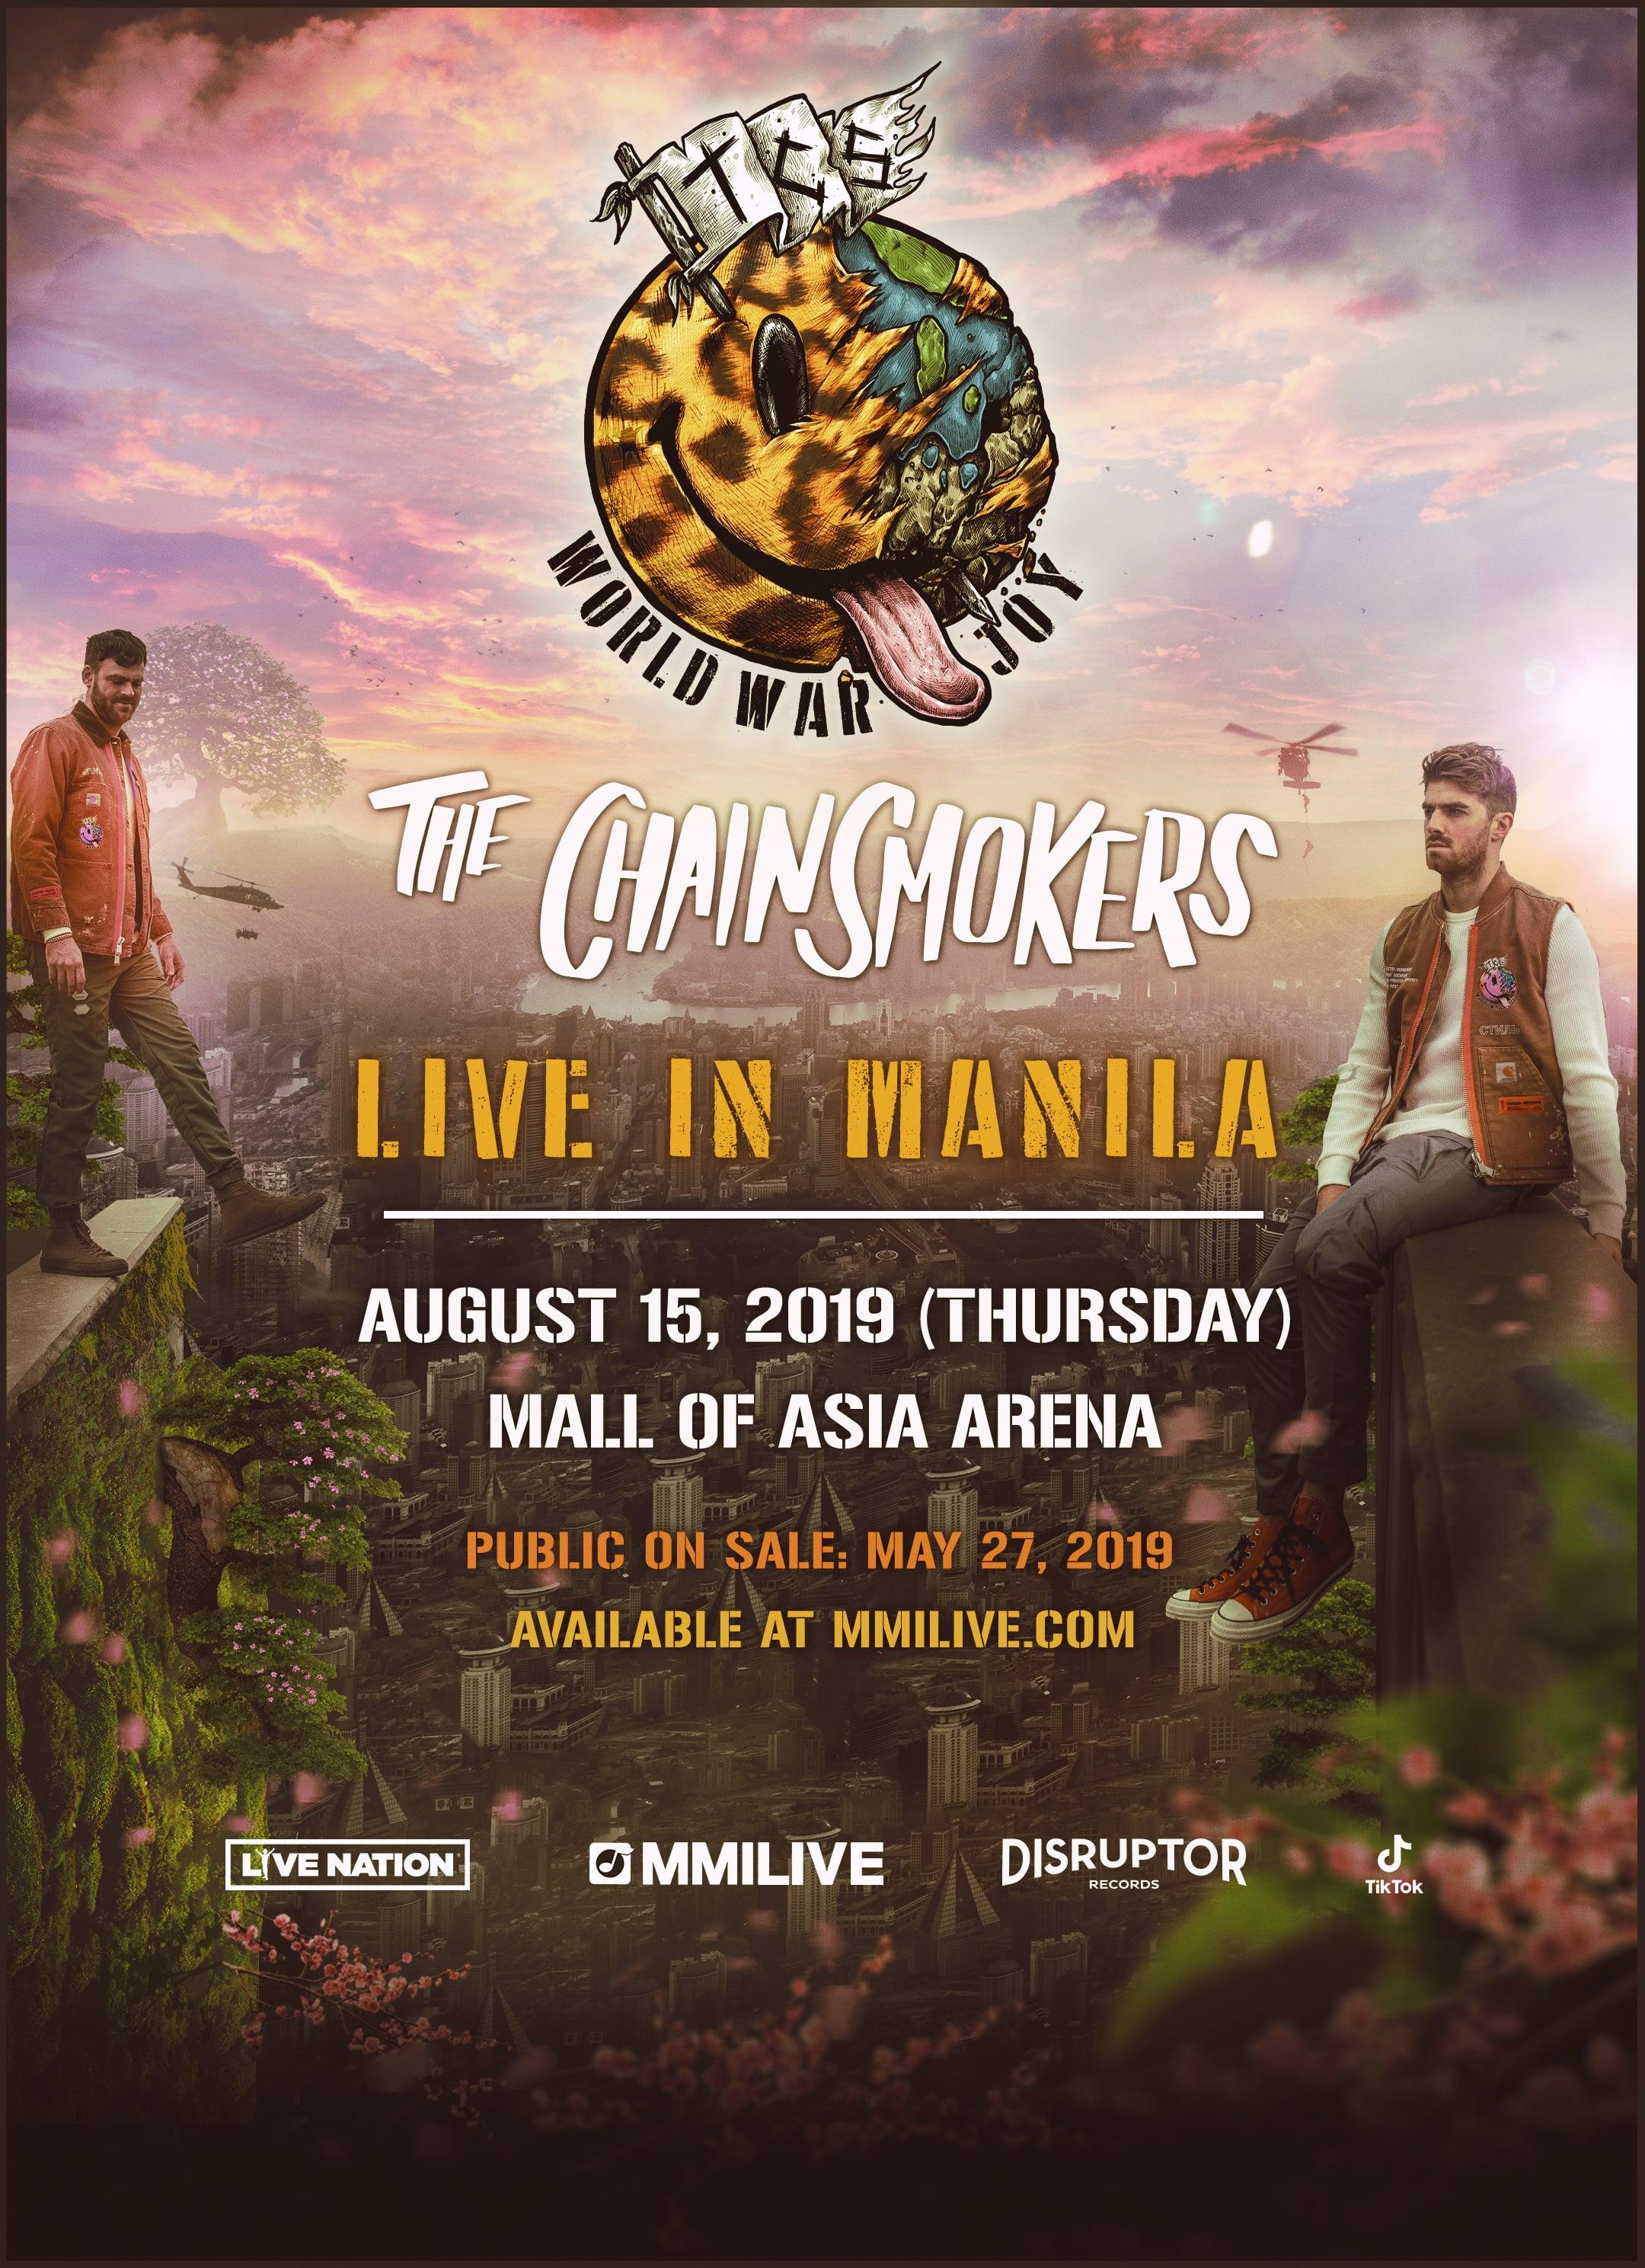 The Chainsmokers World War Joy Tour Live in Manila 2019